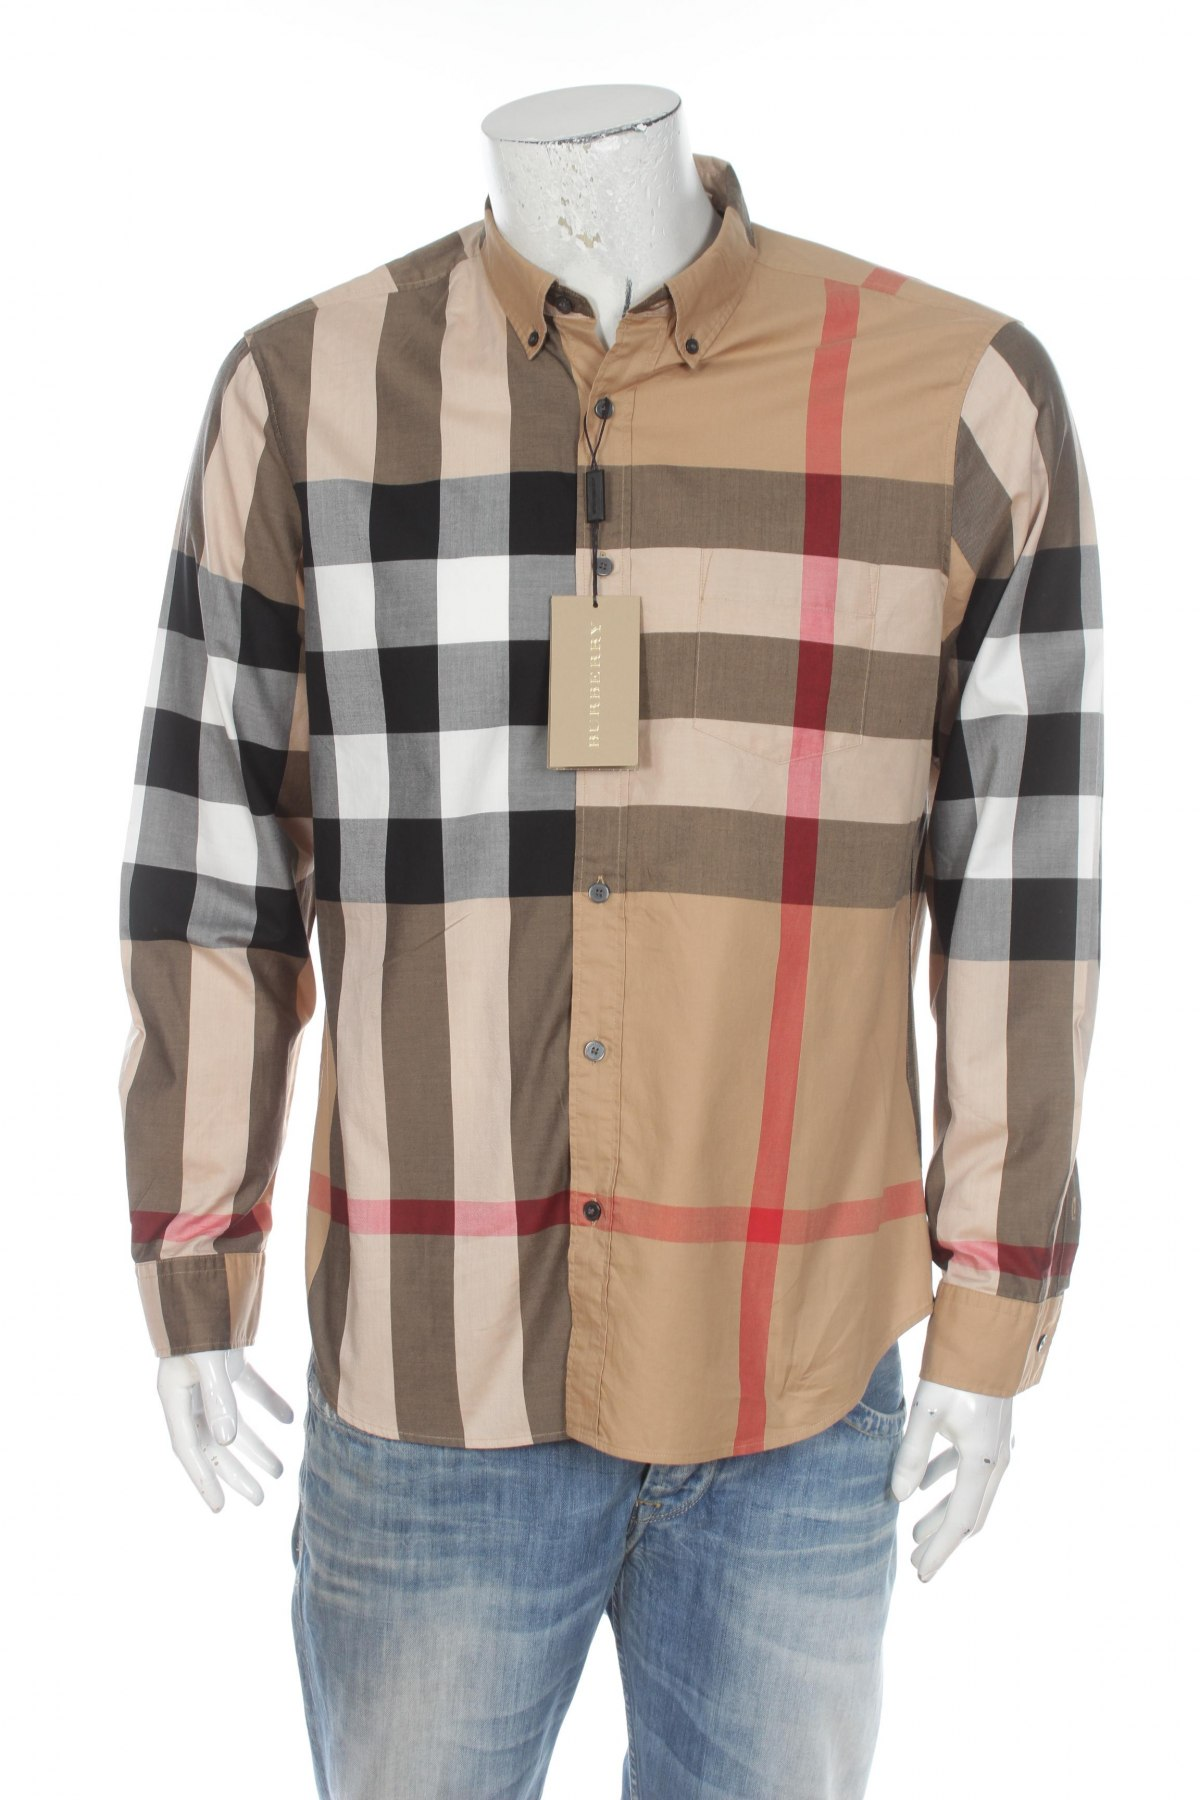 1b5e88bb18a5 Ανδρικό πουκάμισο Burberry - σε συμφέρουσα τιμή στο Remix -  100027126